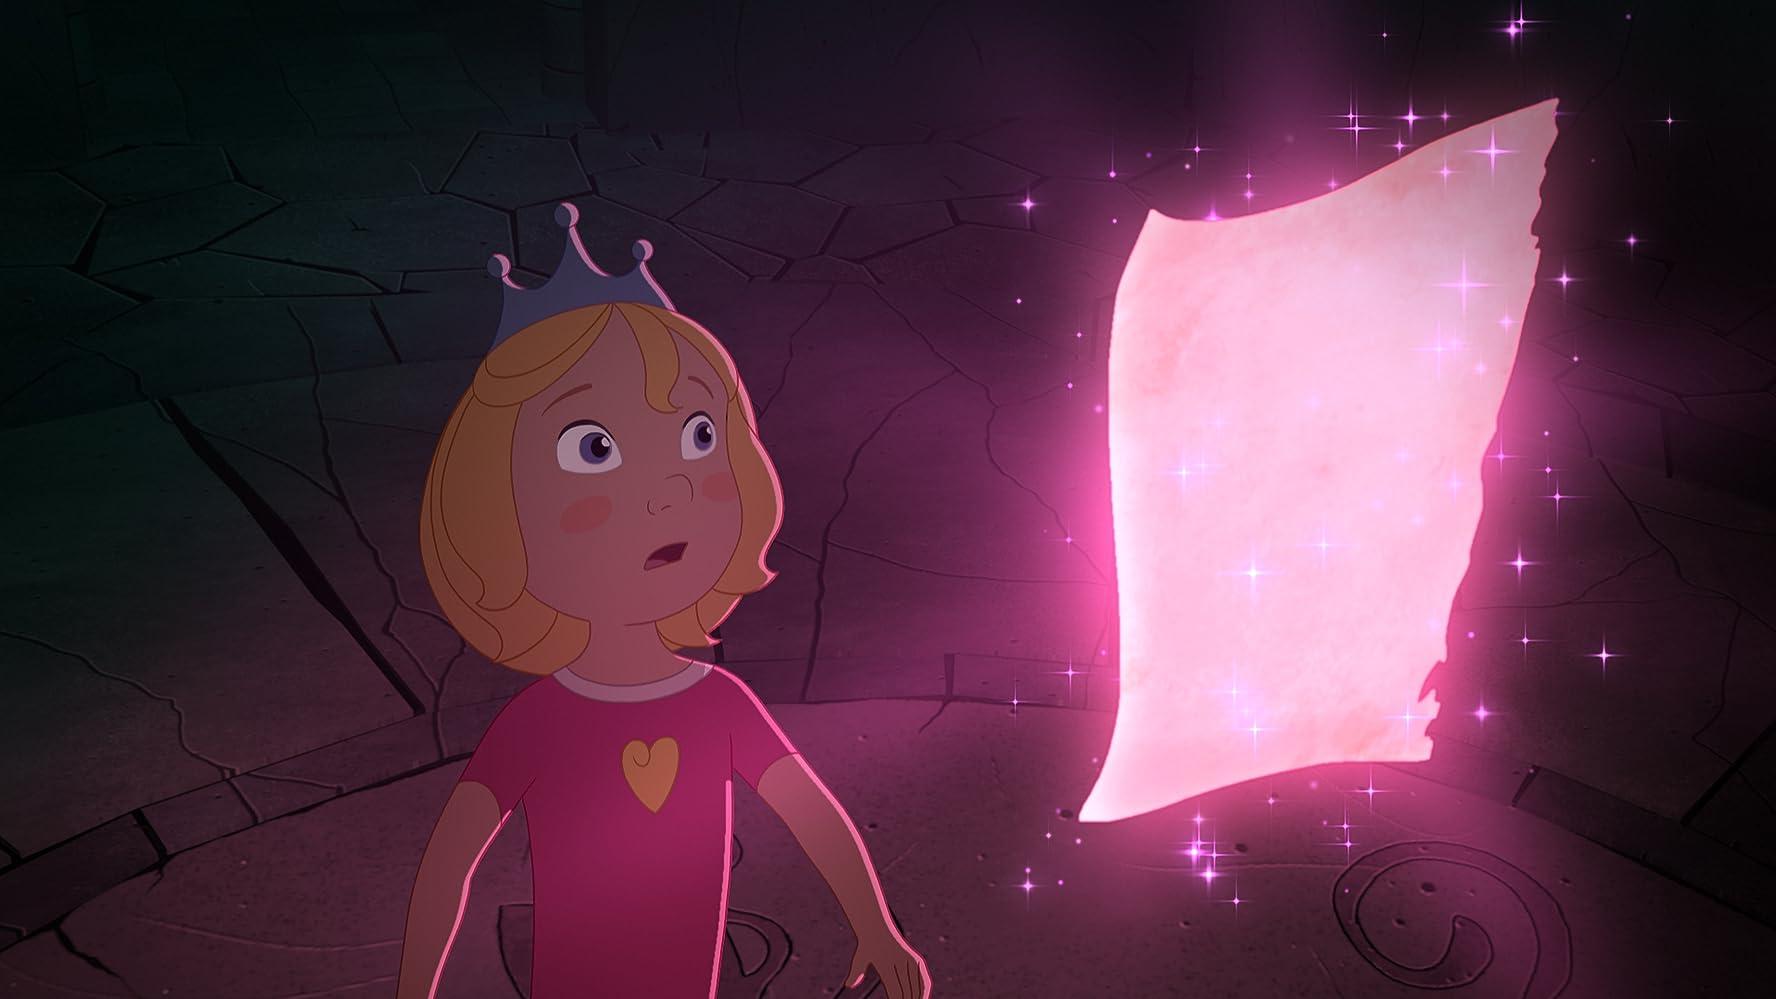 Povestea prințesei Emmy - Princess Emmy (2019) Online Subtitrat in Romana